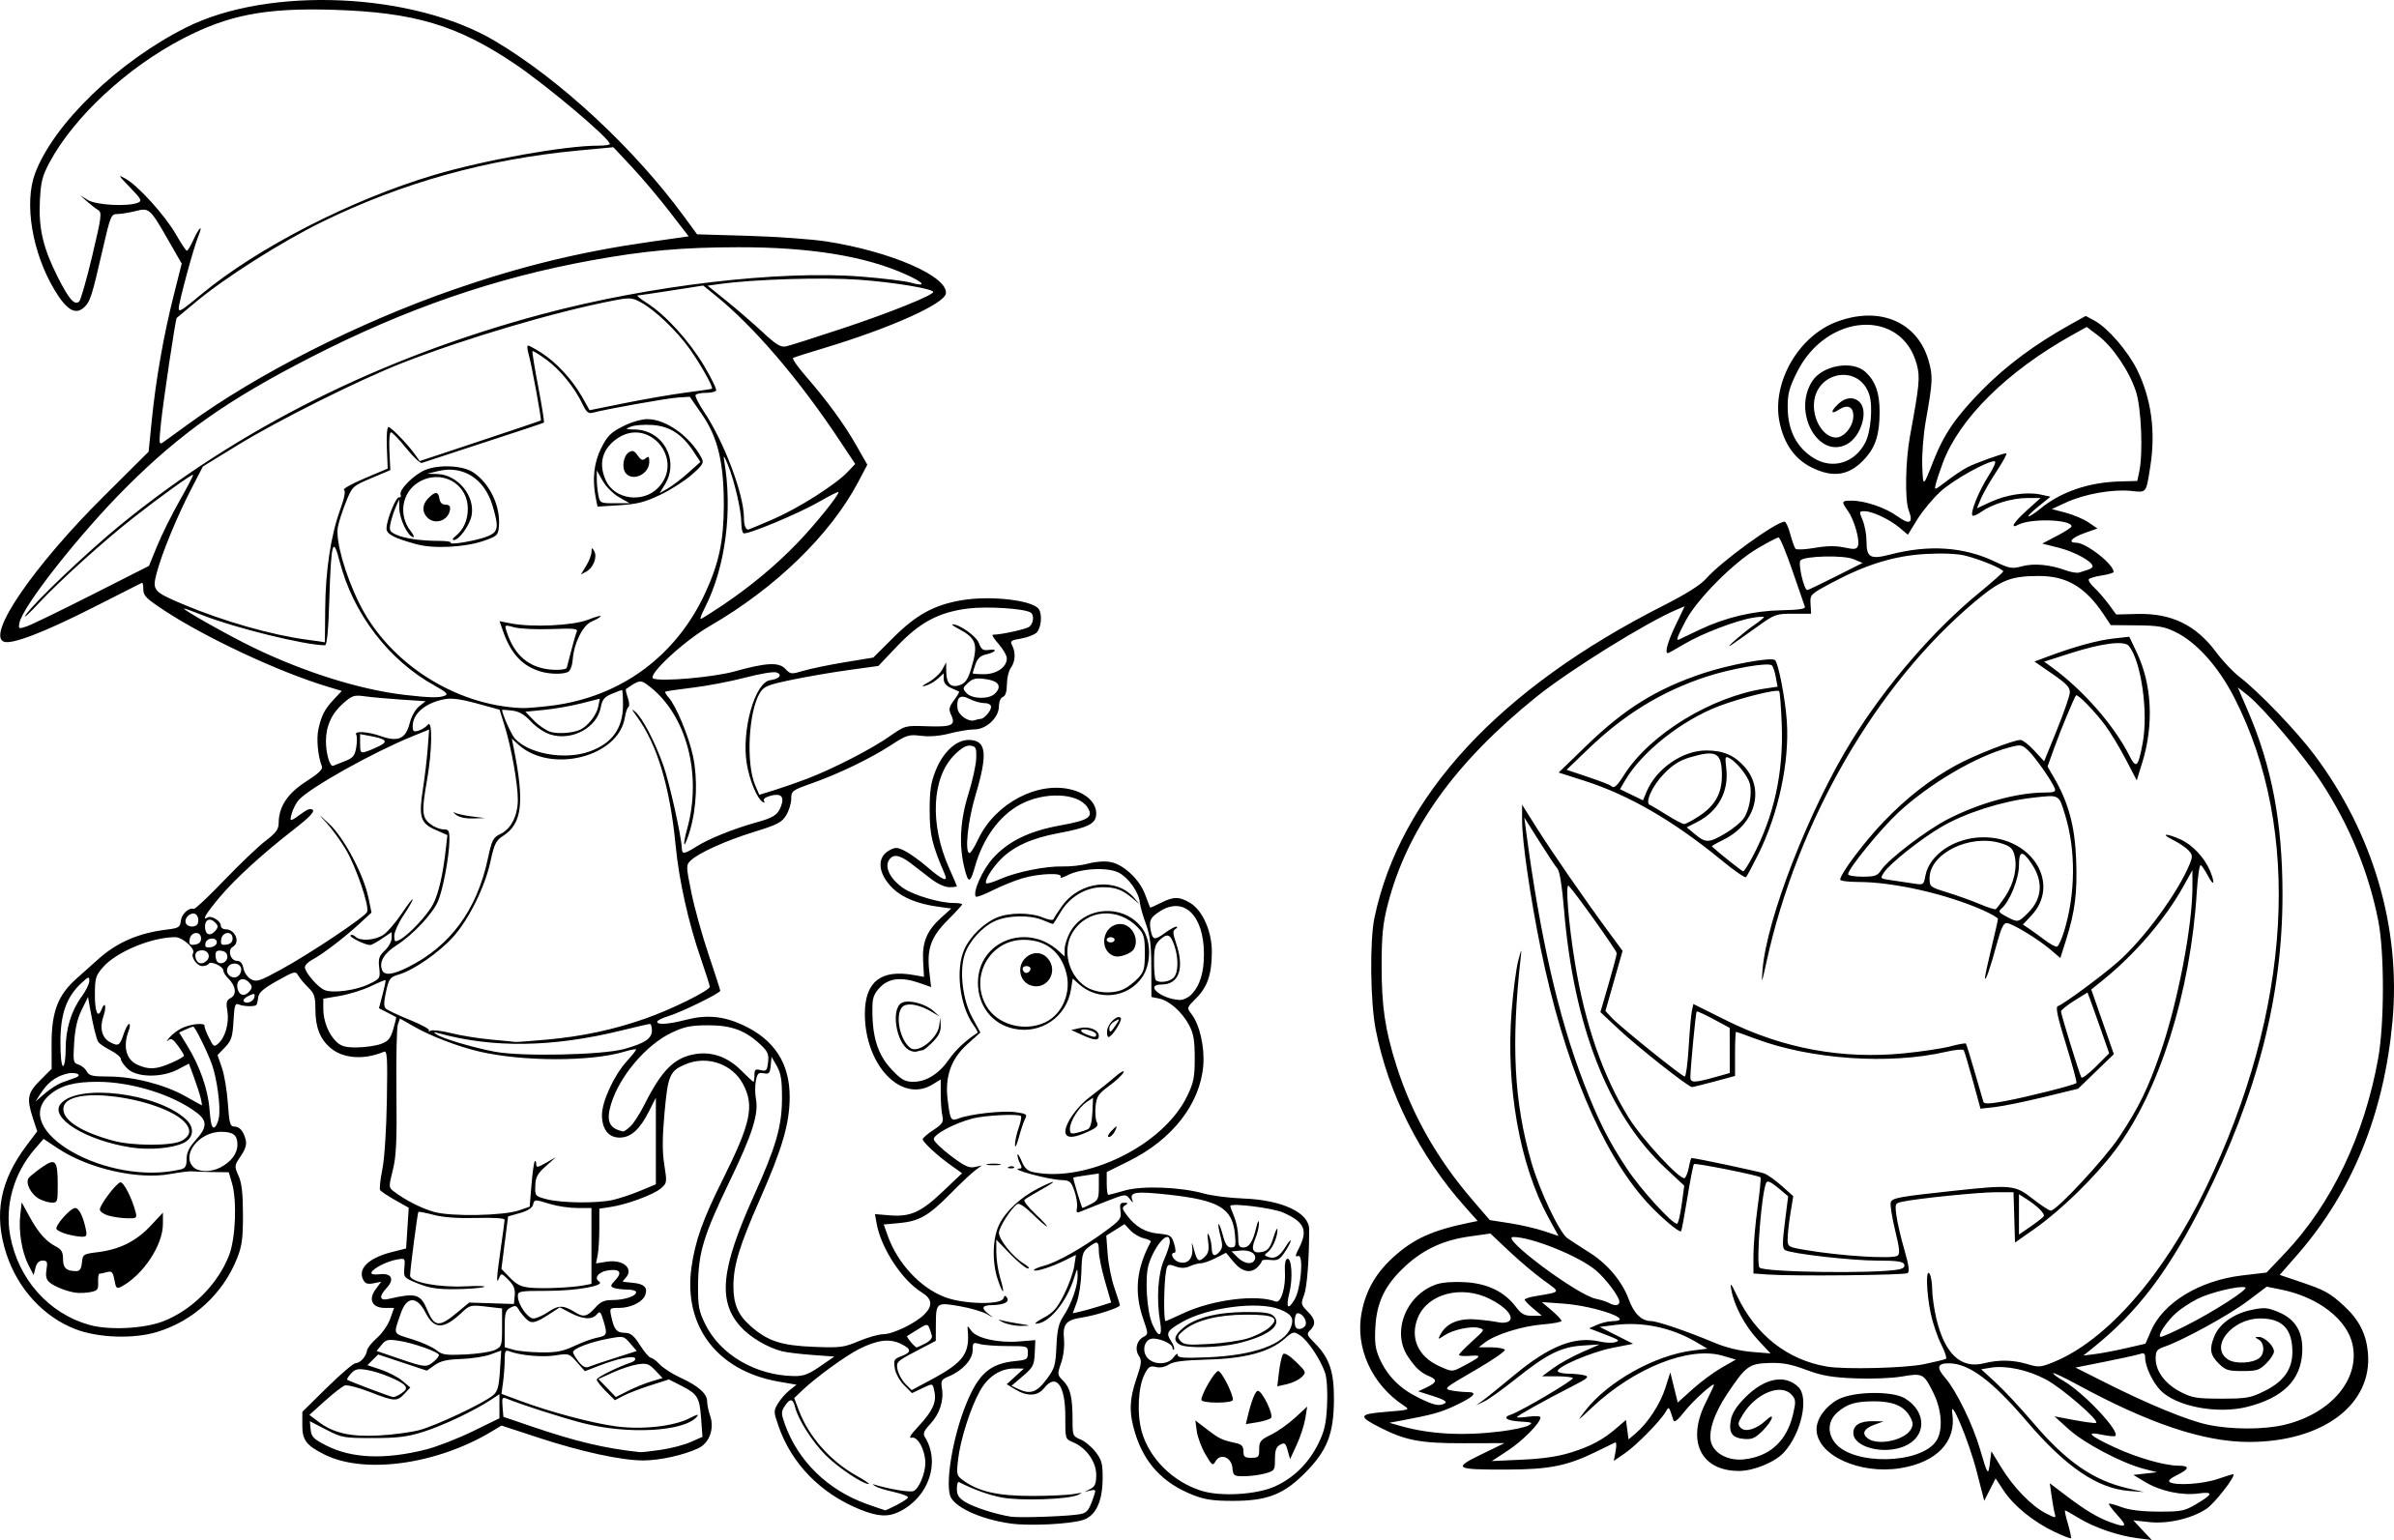 Coloriage Dora Halloween Dessin À Imprimer Sur Coloriages destiné Coloriage Dora À Imprimer